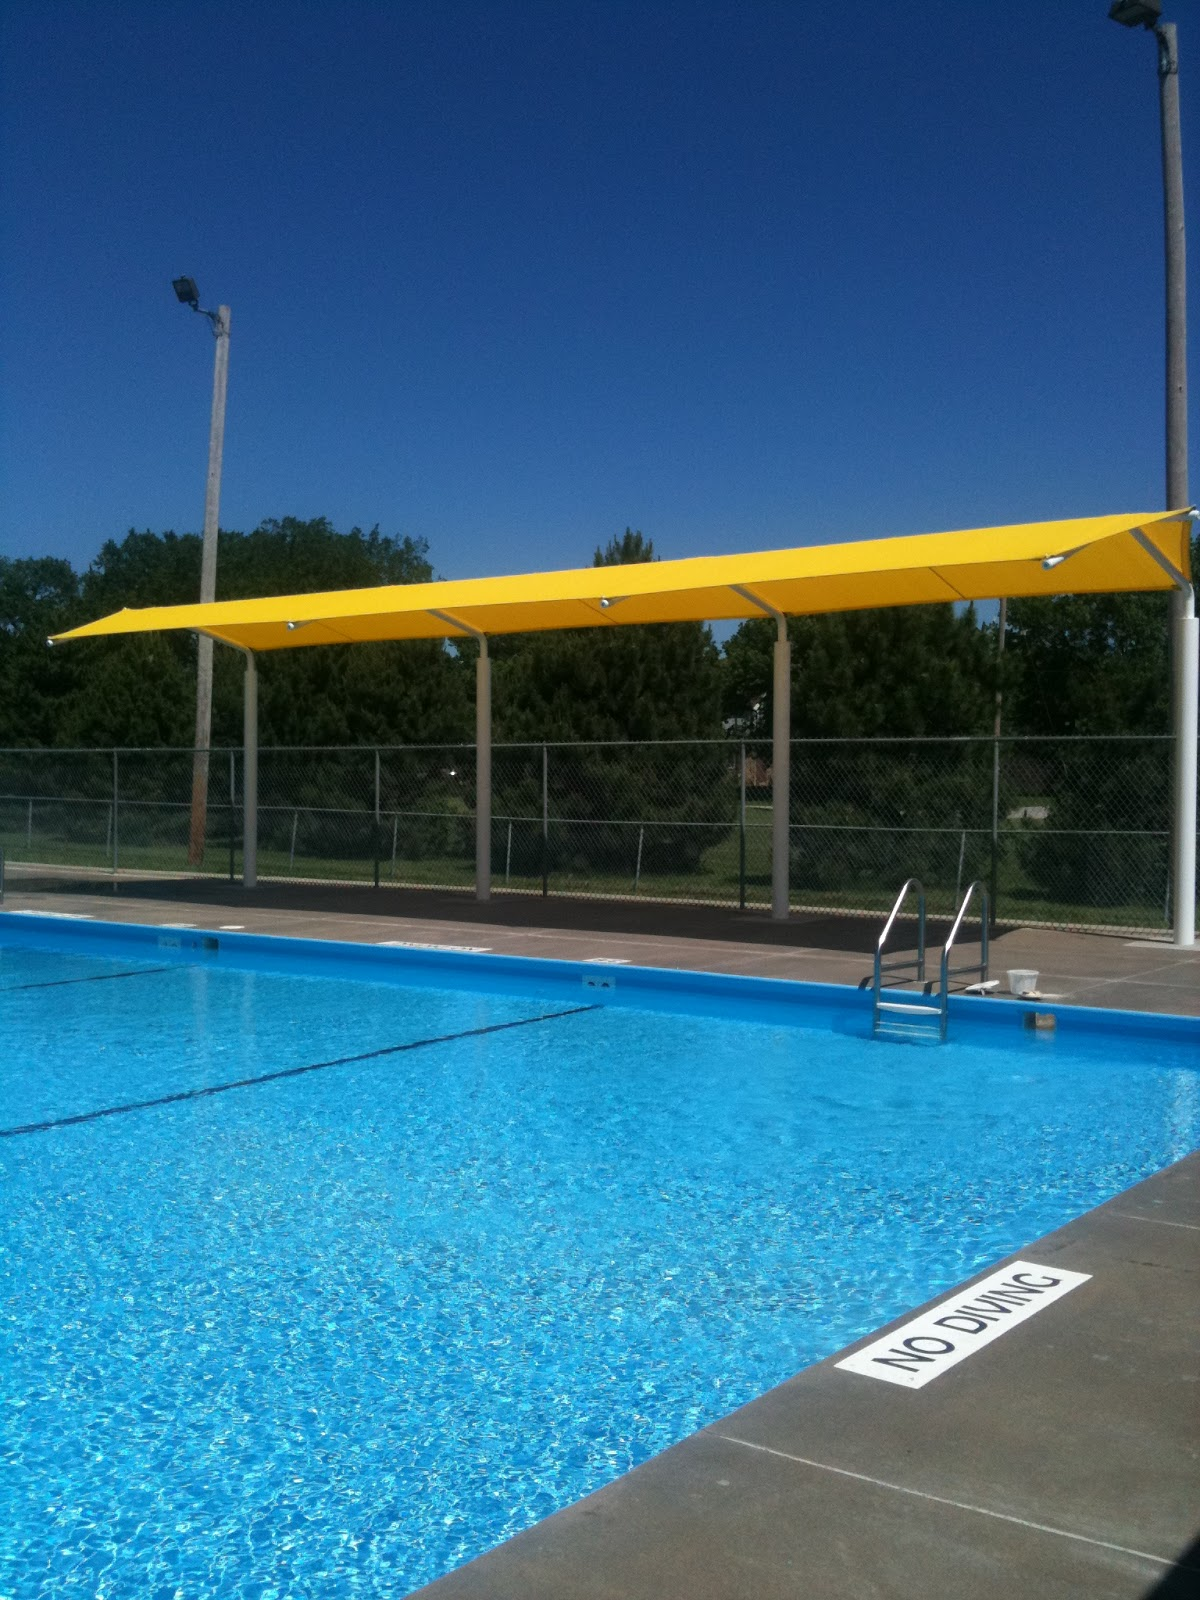 Swimming pool shade in dubai abu dhabi uae for Swimming pool suppliers in dubai